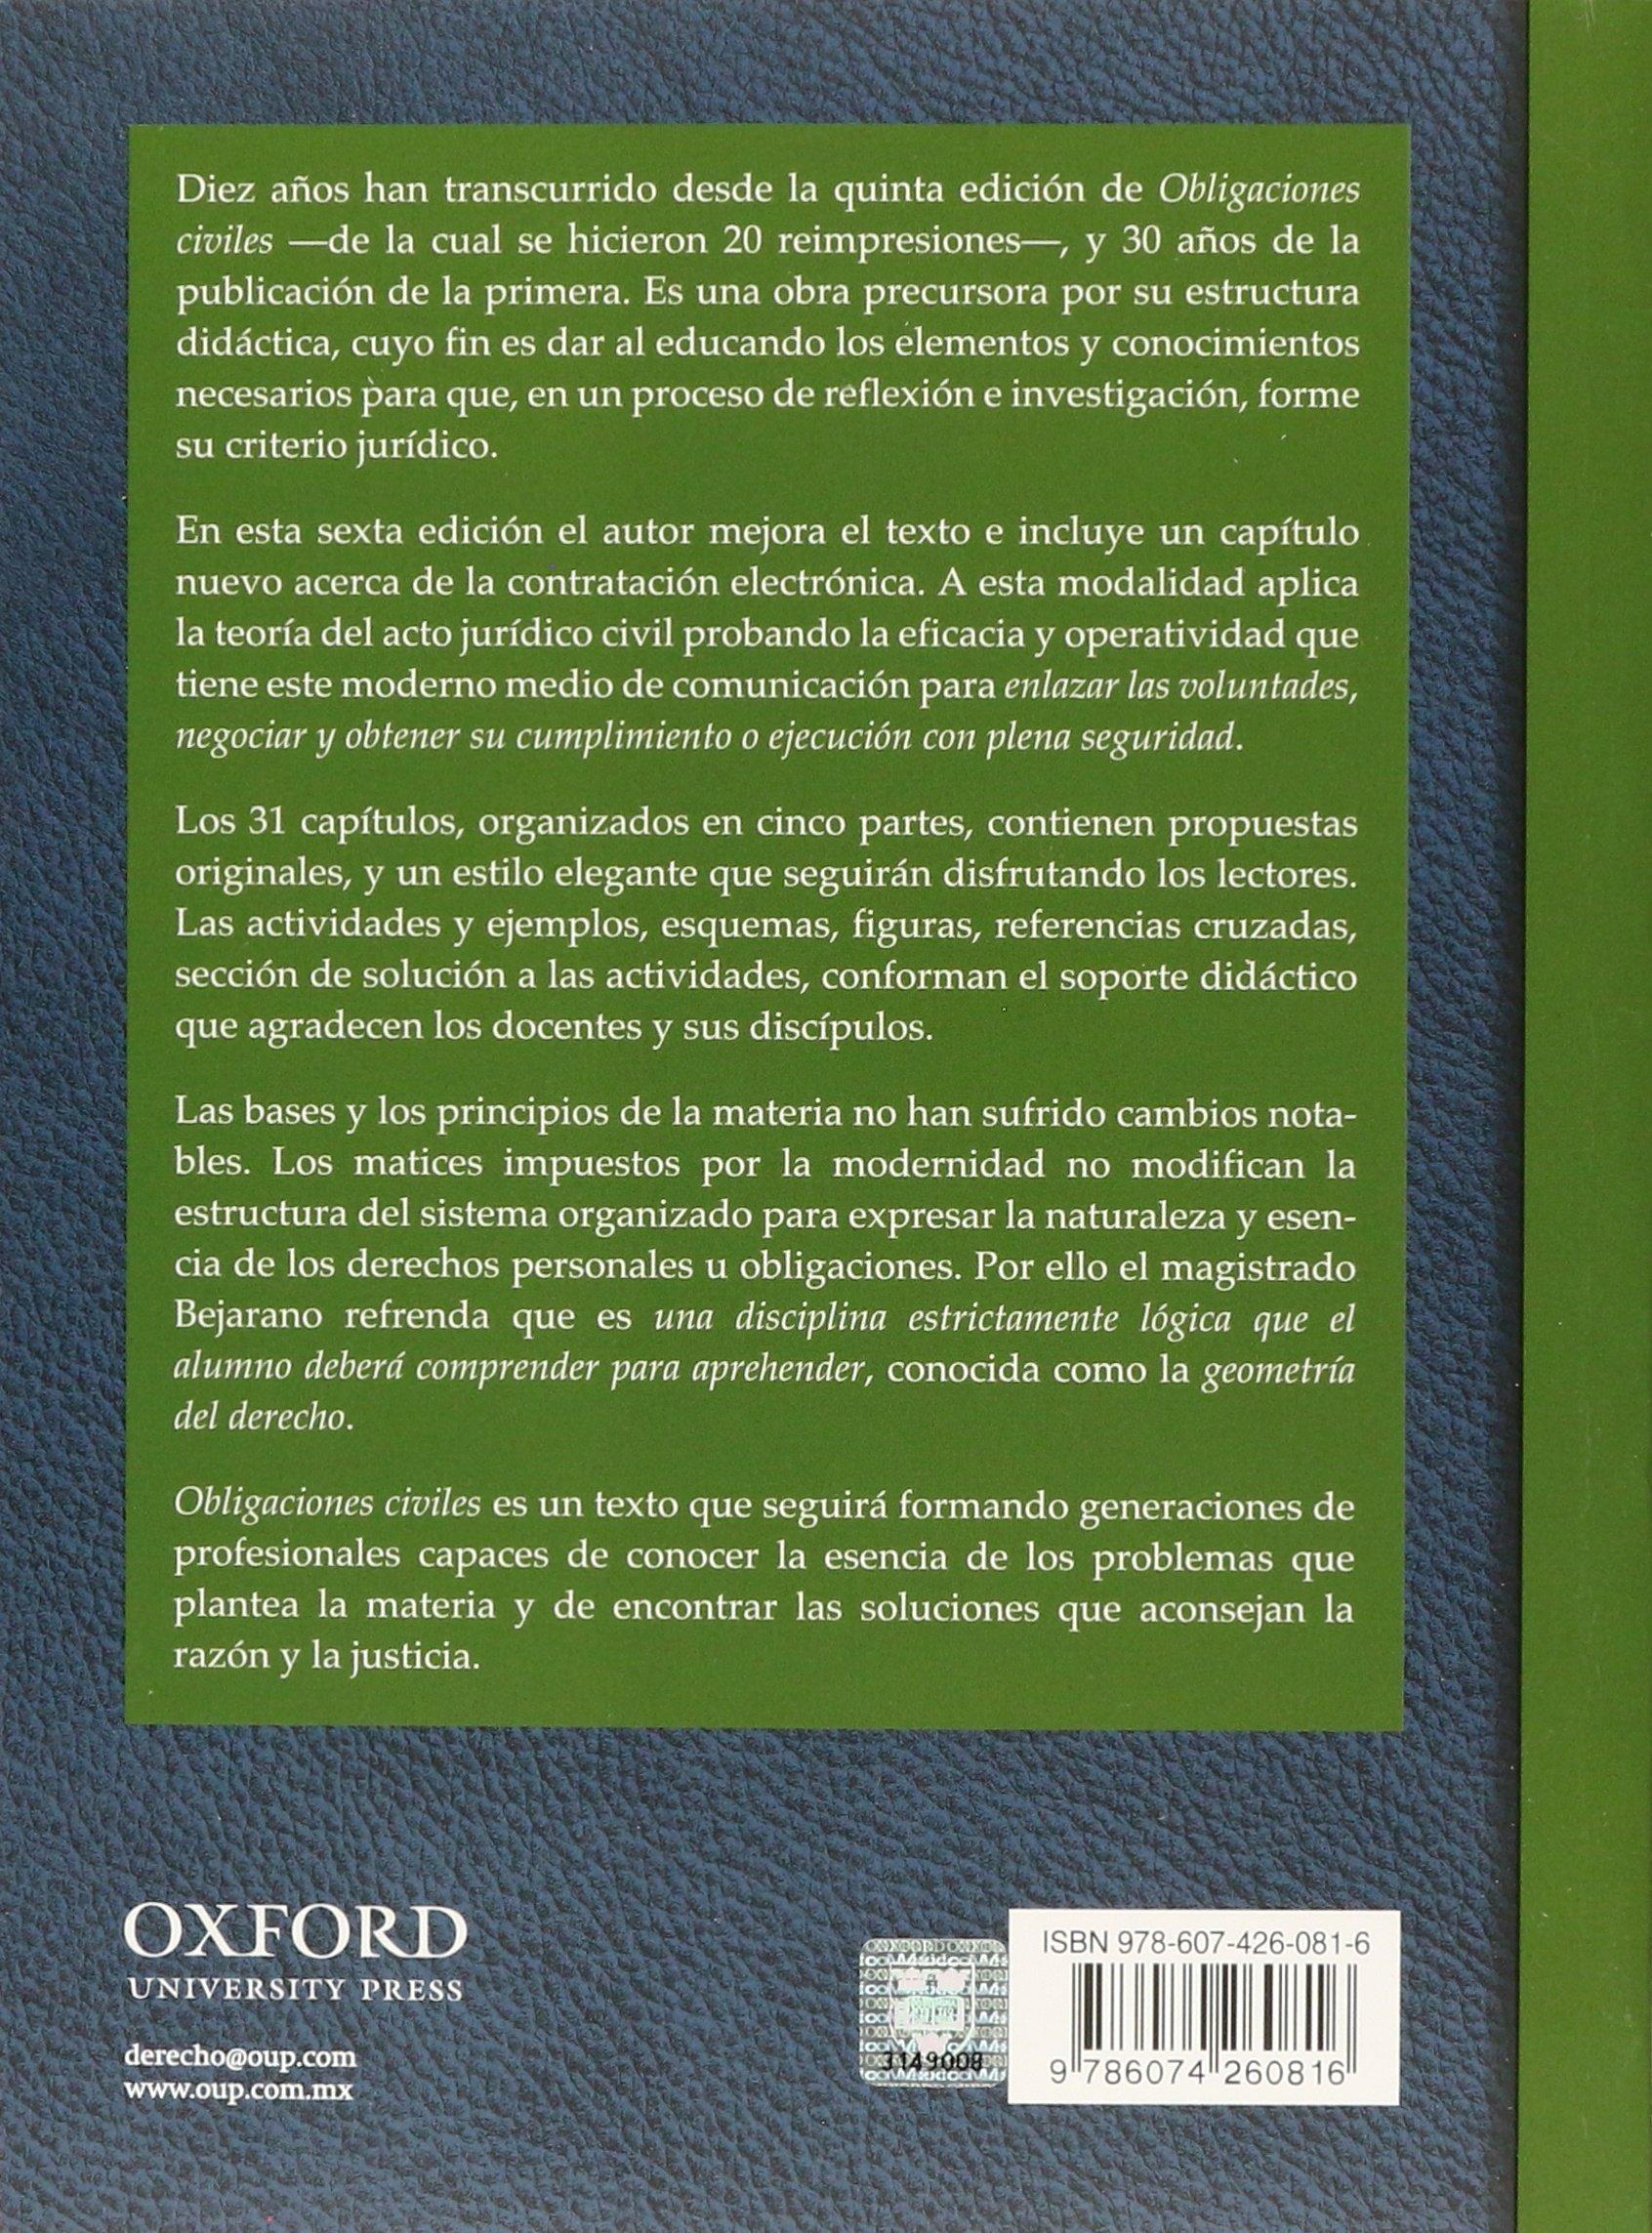 Obligaciones Civiles Bejarano Sanchez M 9786074260816